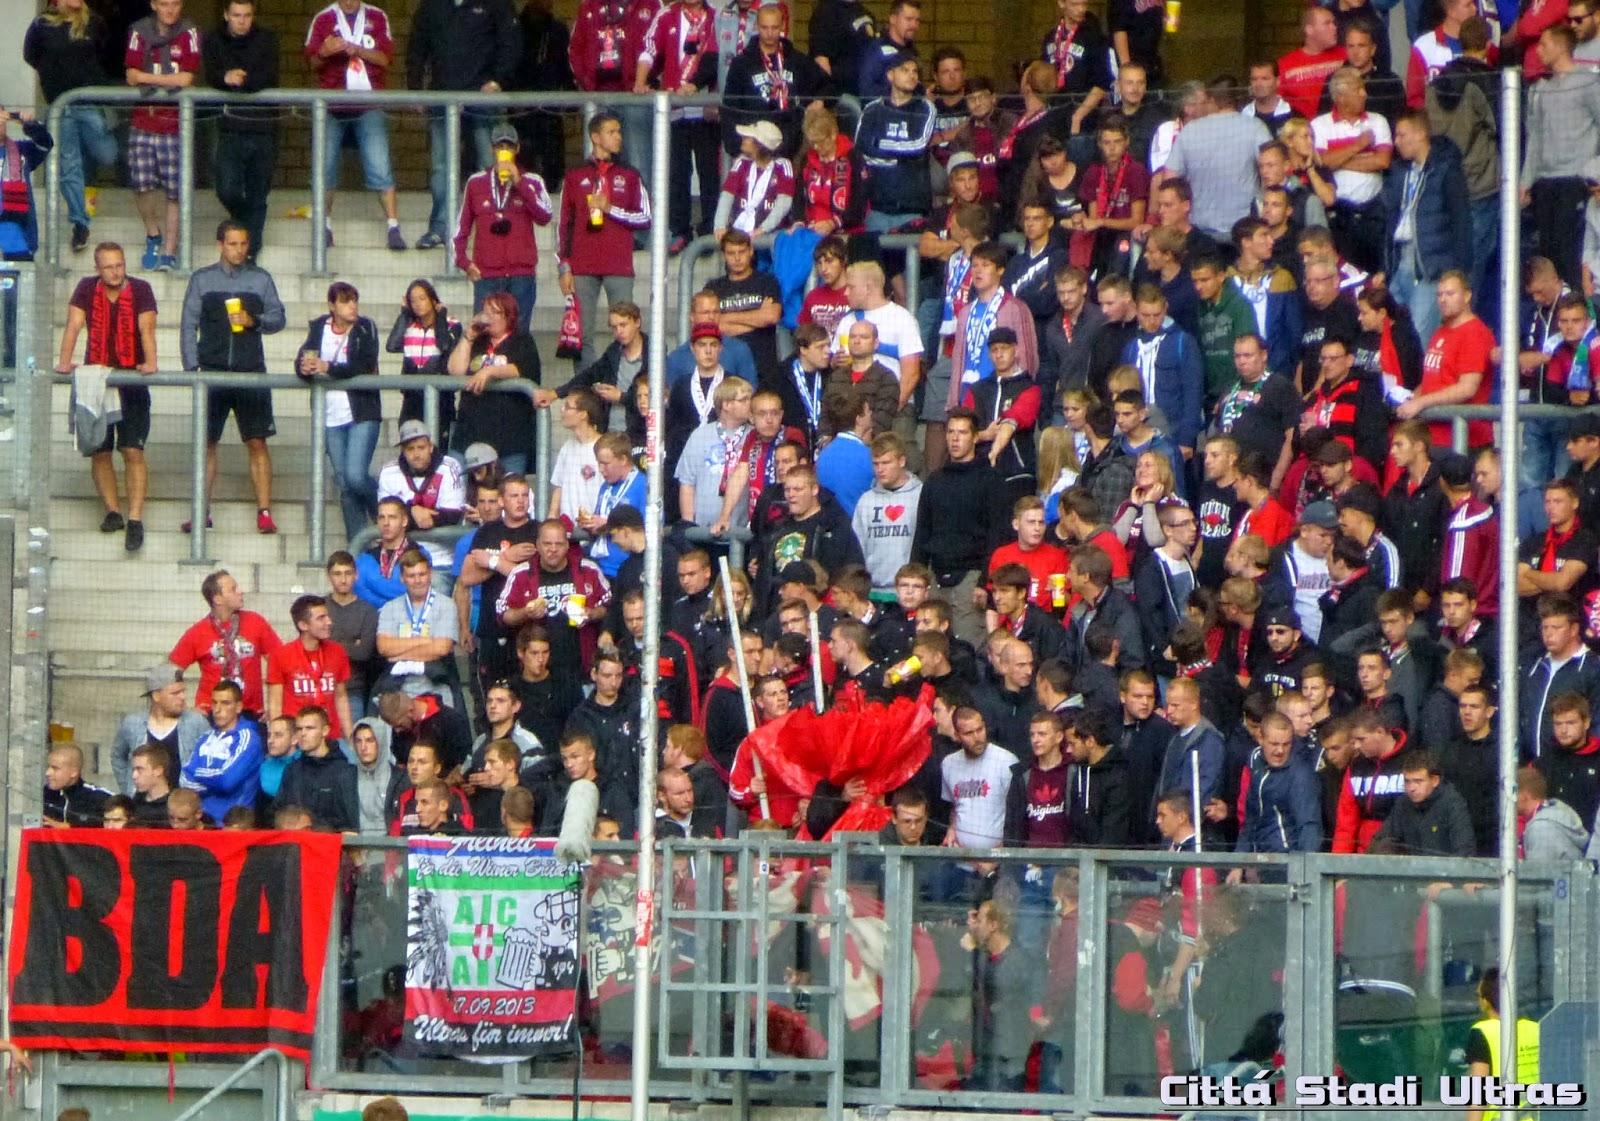 Bda Nürnberg città stadi ultras msv duisburg 1 fc nürnberg